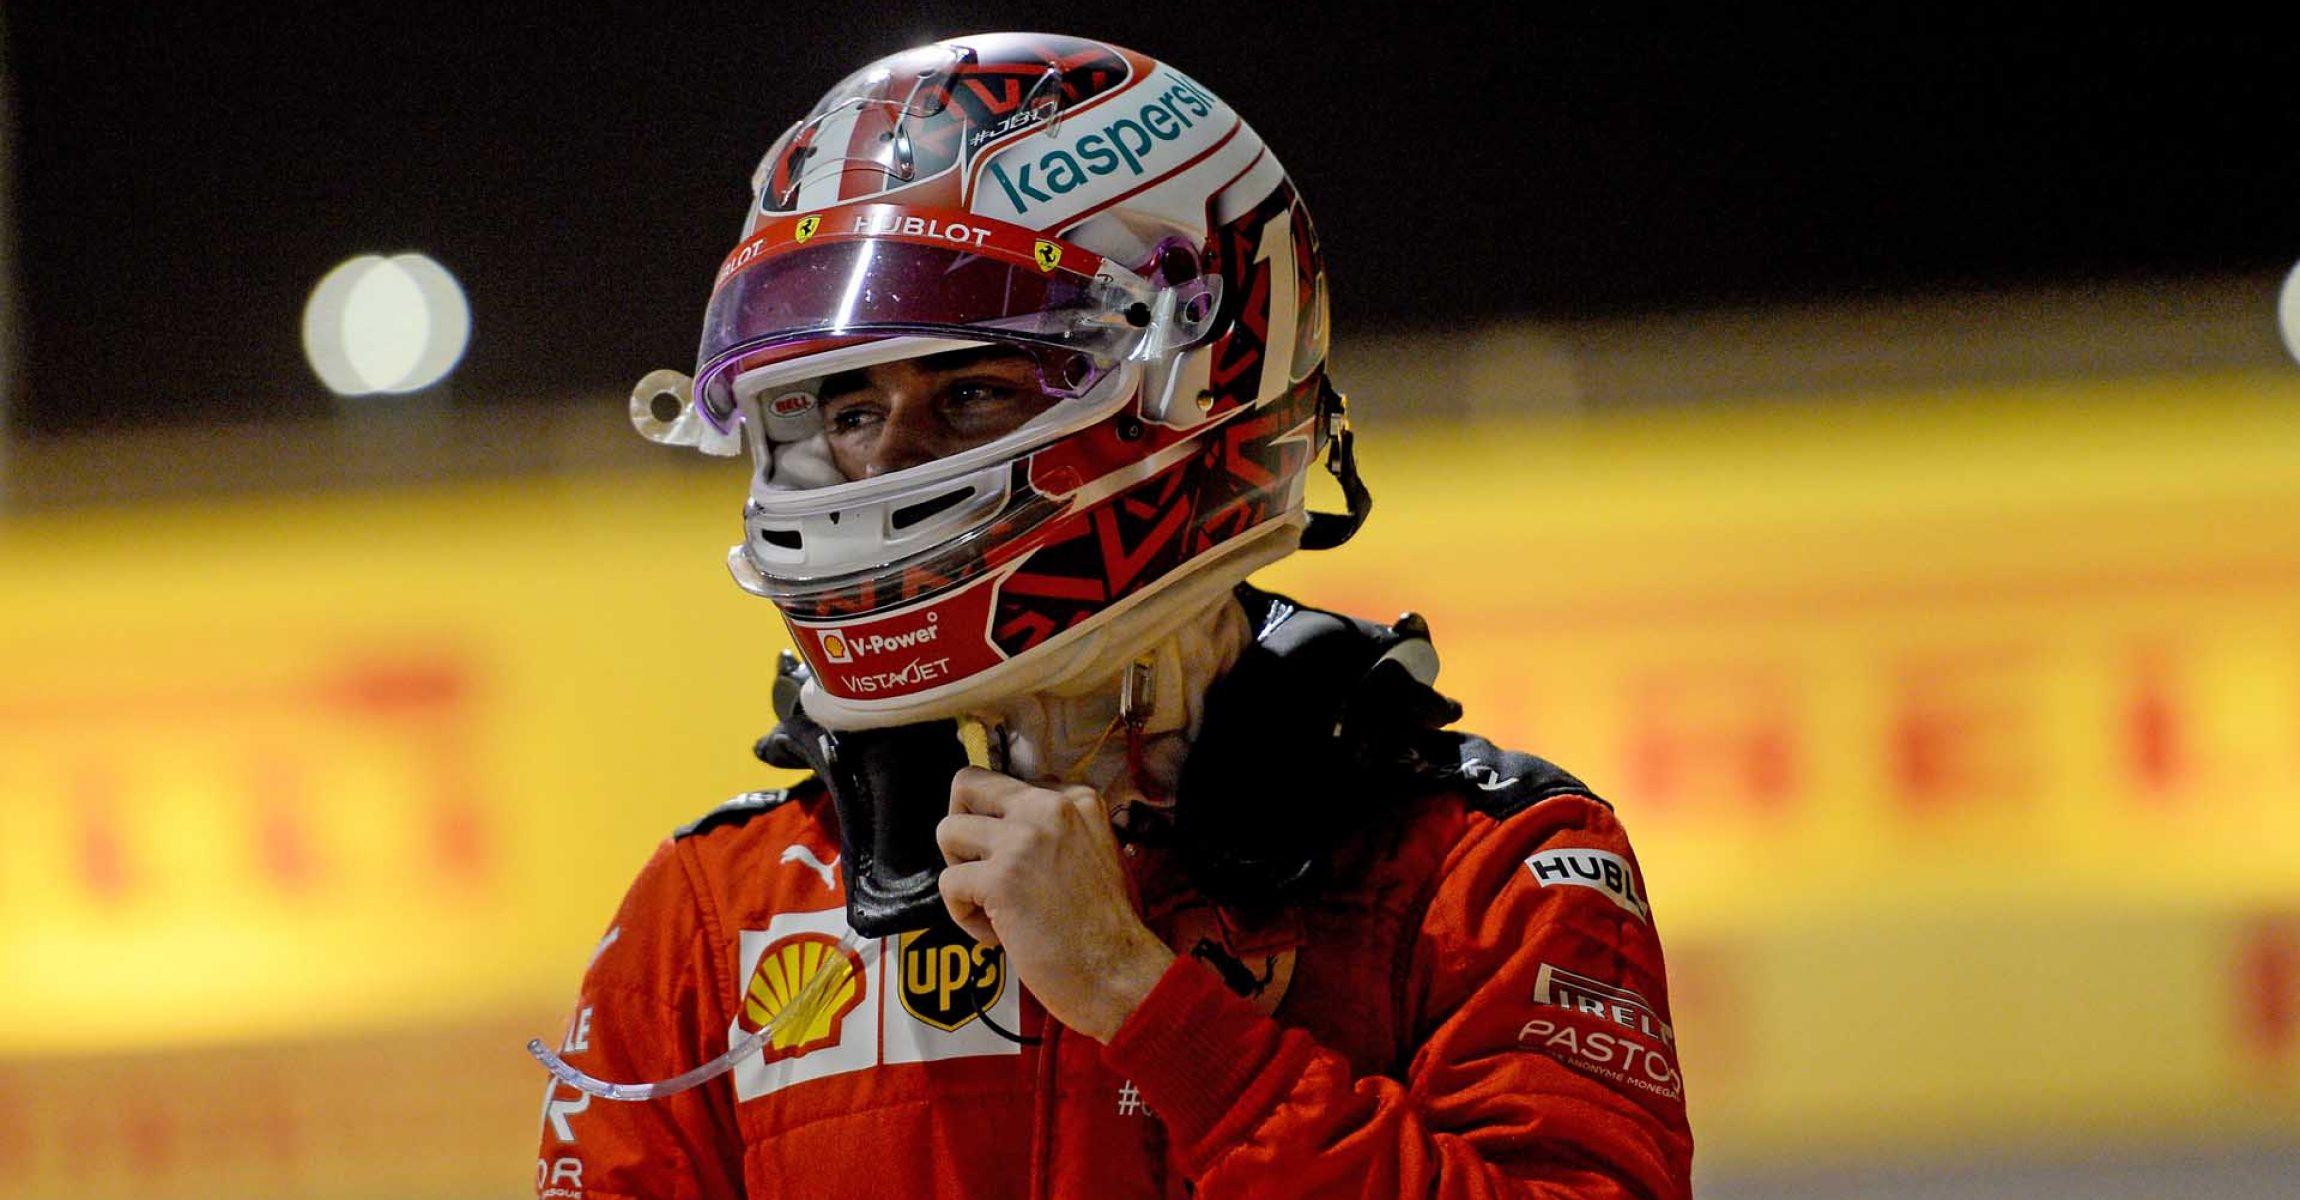 GP SAKHIR  F1/2020 - DOMENICA 06/12/2020   credit: @Scuderia Ferrari Press Office Charles Leclerc